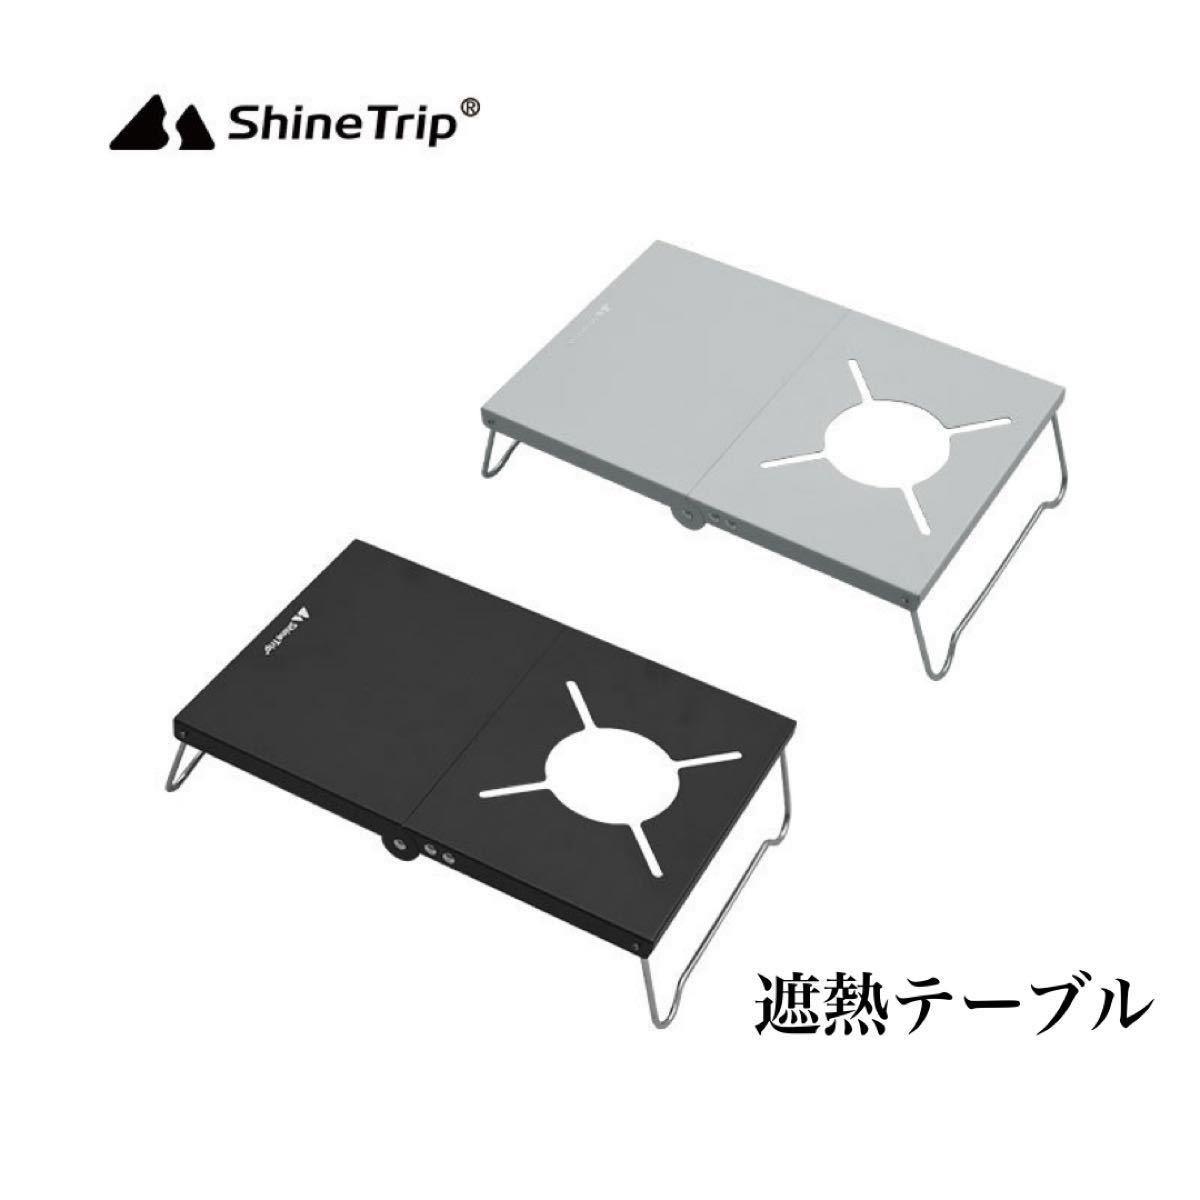 st-310 SOTO 遮熱テーブル シングルバーナー ソロキャンプ